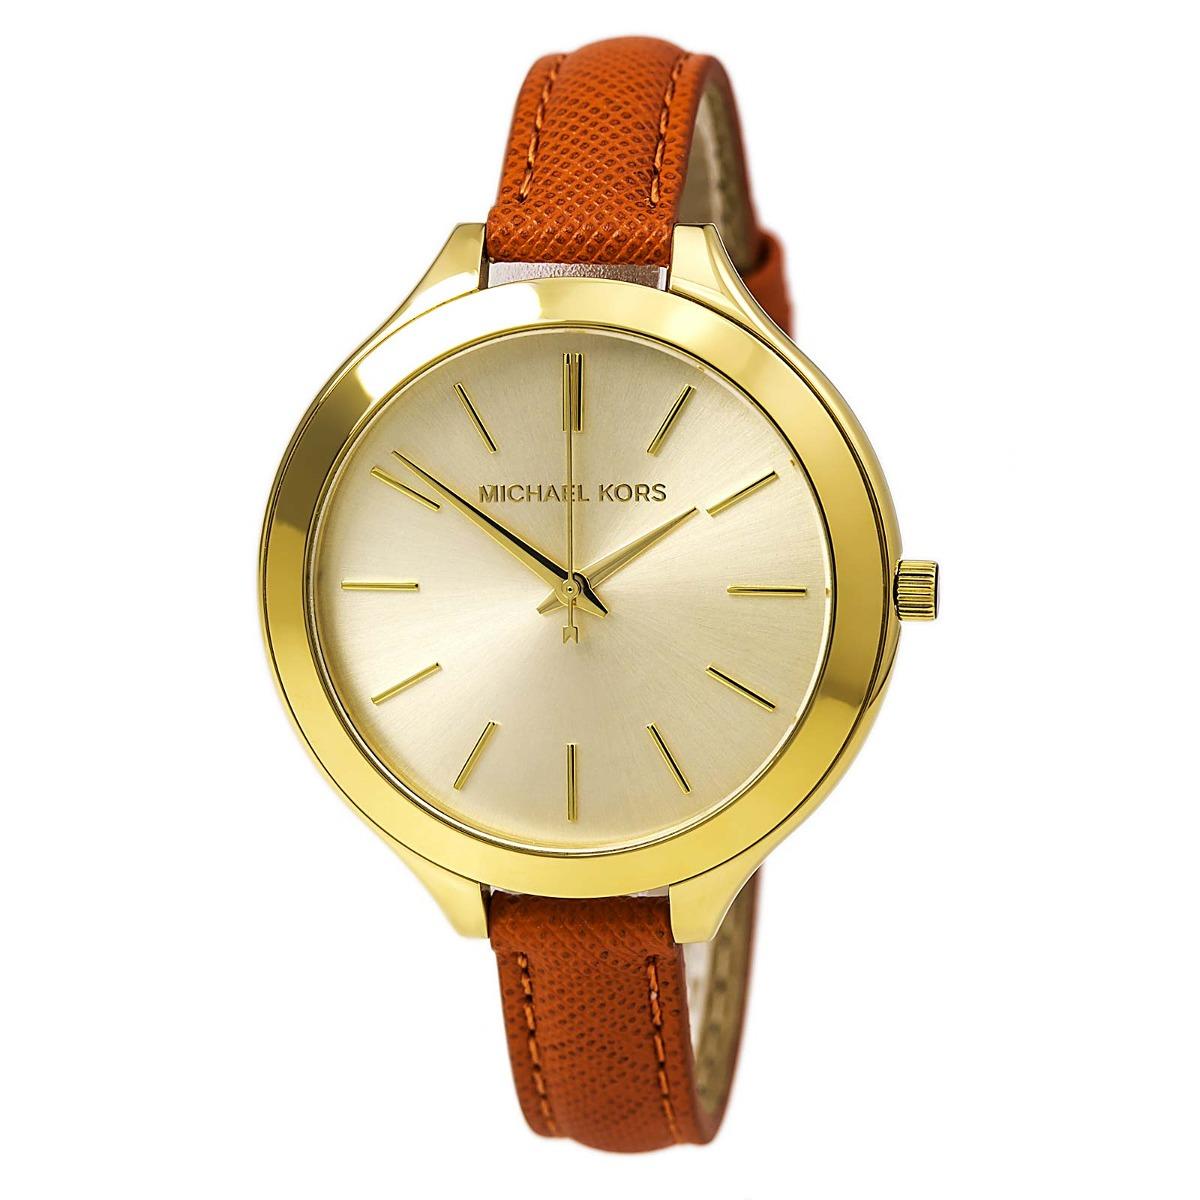 Mk2275 Reloj Correa Mujer Cuero Kors Para De Michael m80wyOvNn